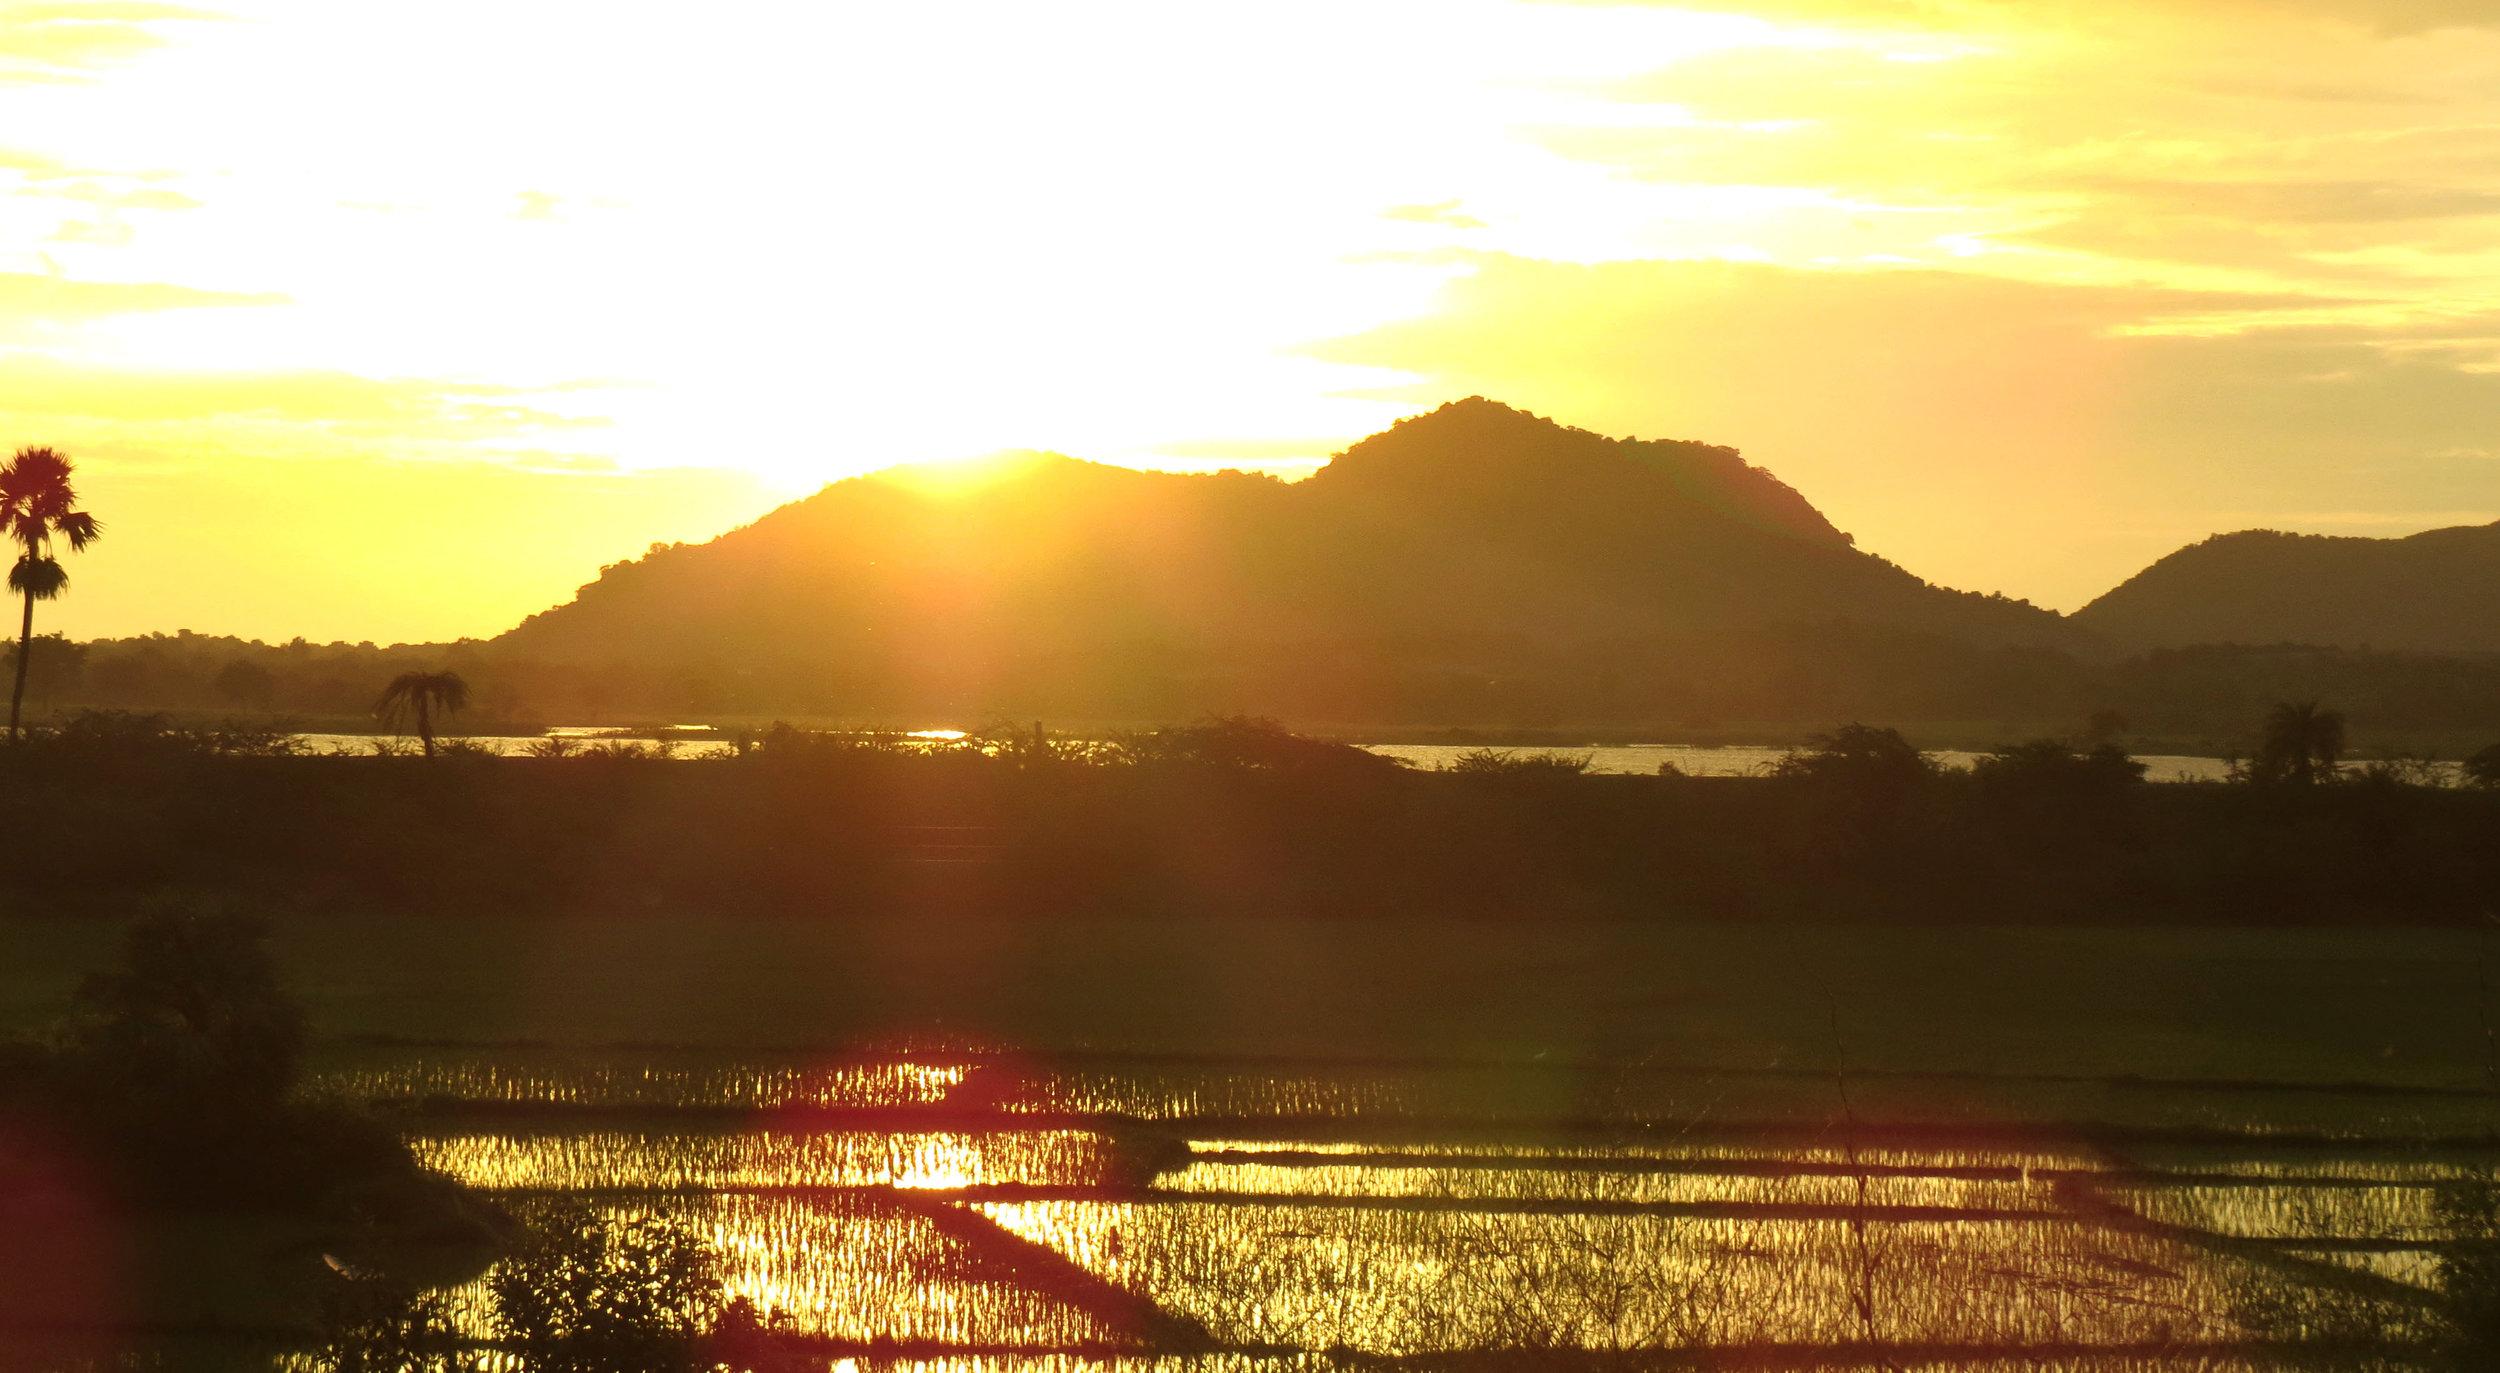 Sunrise over human-made lake irrigated fields